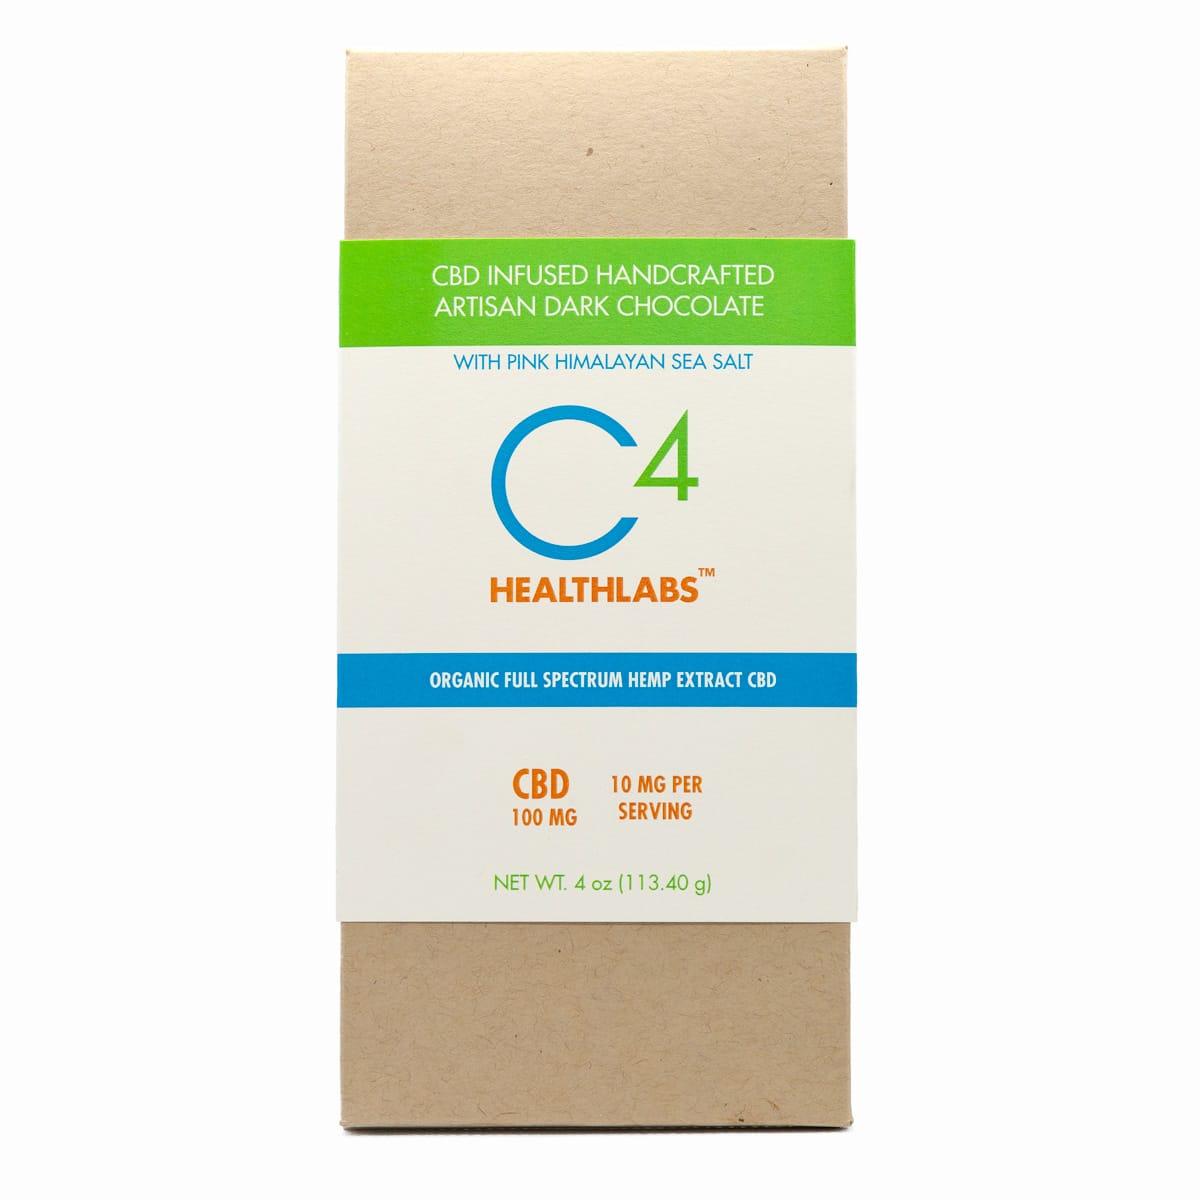 C4 Healthlabs 100 MG CBD Chocolate Bar